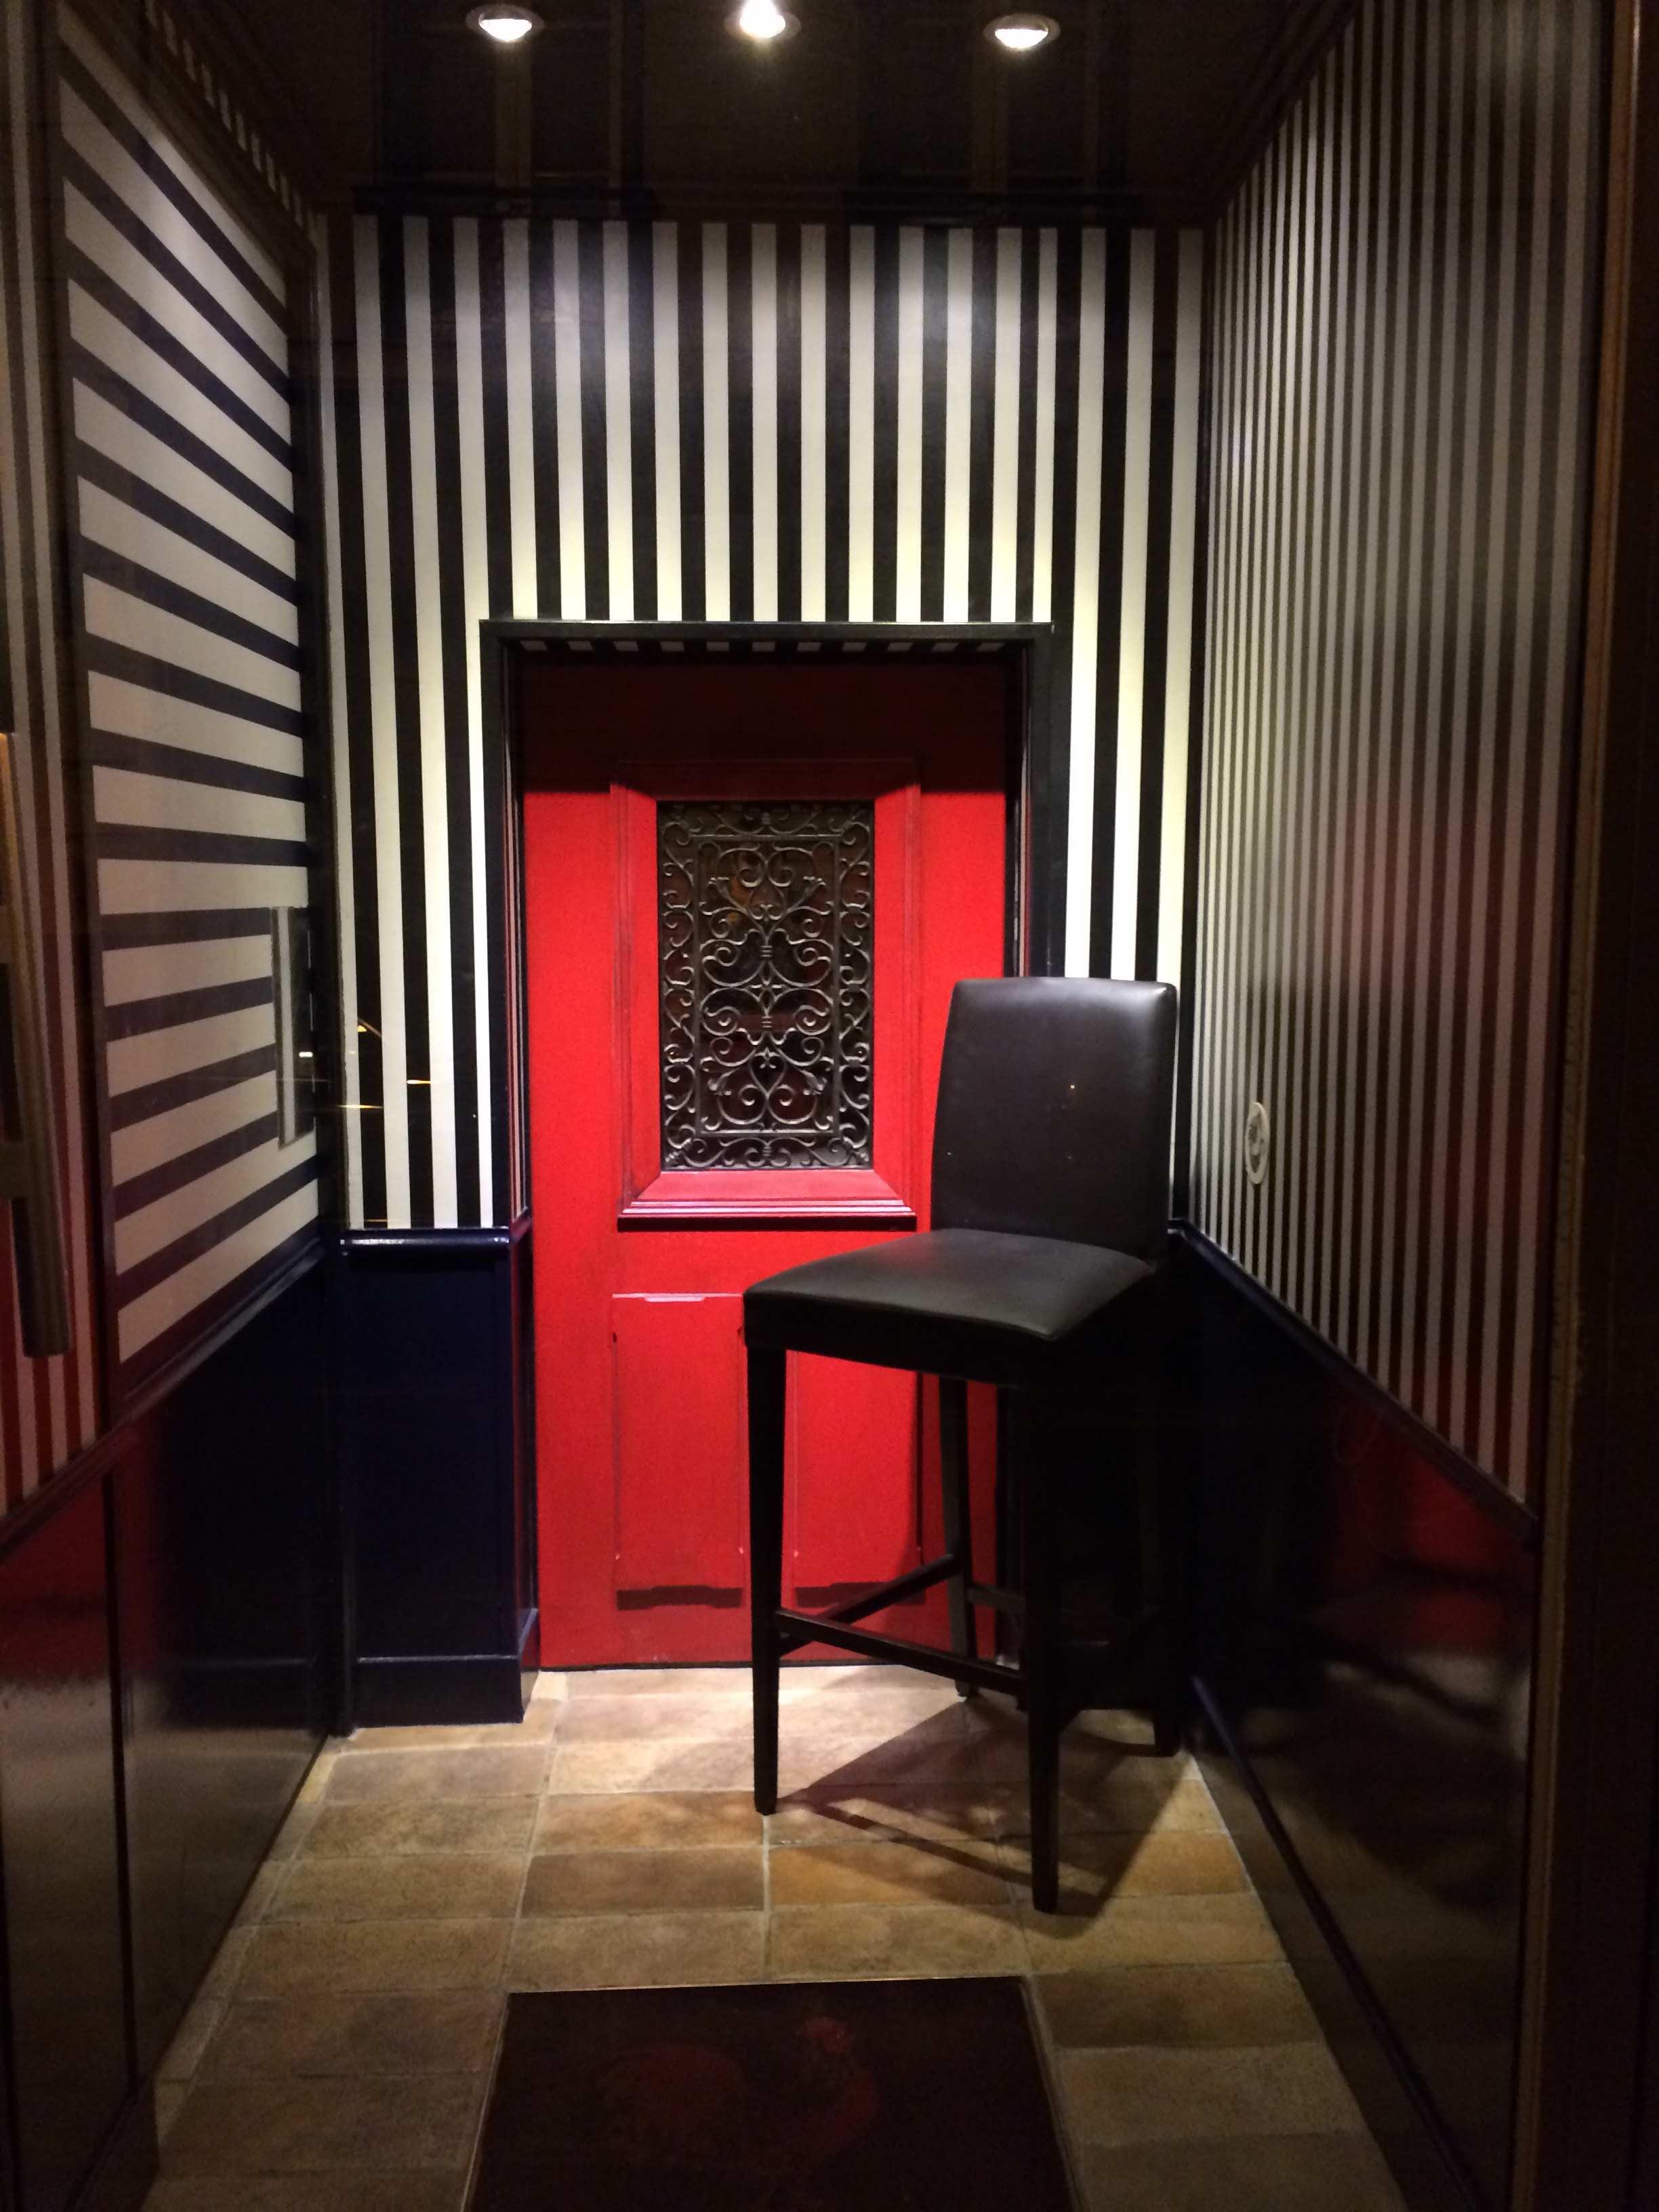 10 bars cocktails paris o l 39 on peut manger coup de fourchette blog guide des restaurants. Black Bedroom Furniture Sets. Home Design Ideas